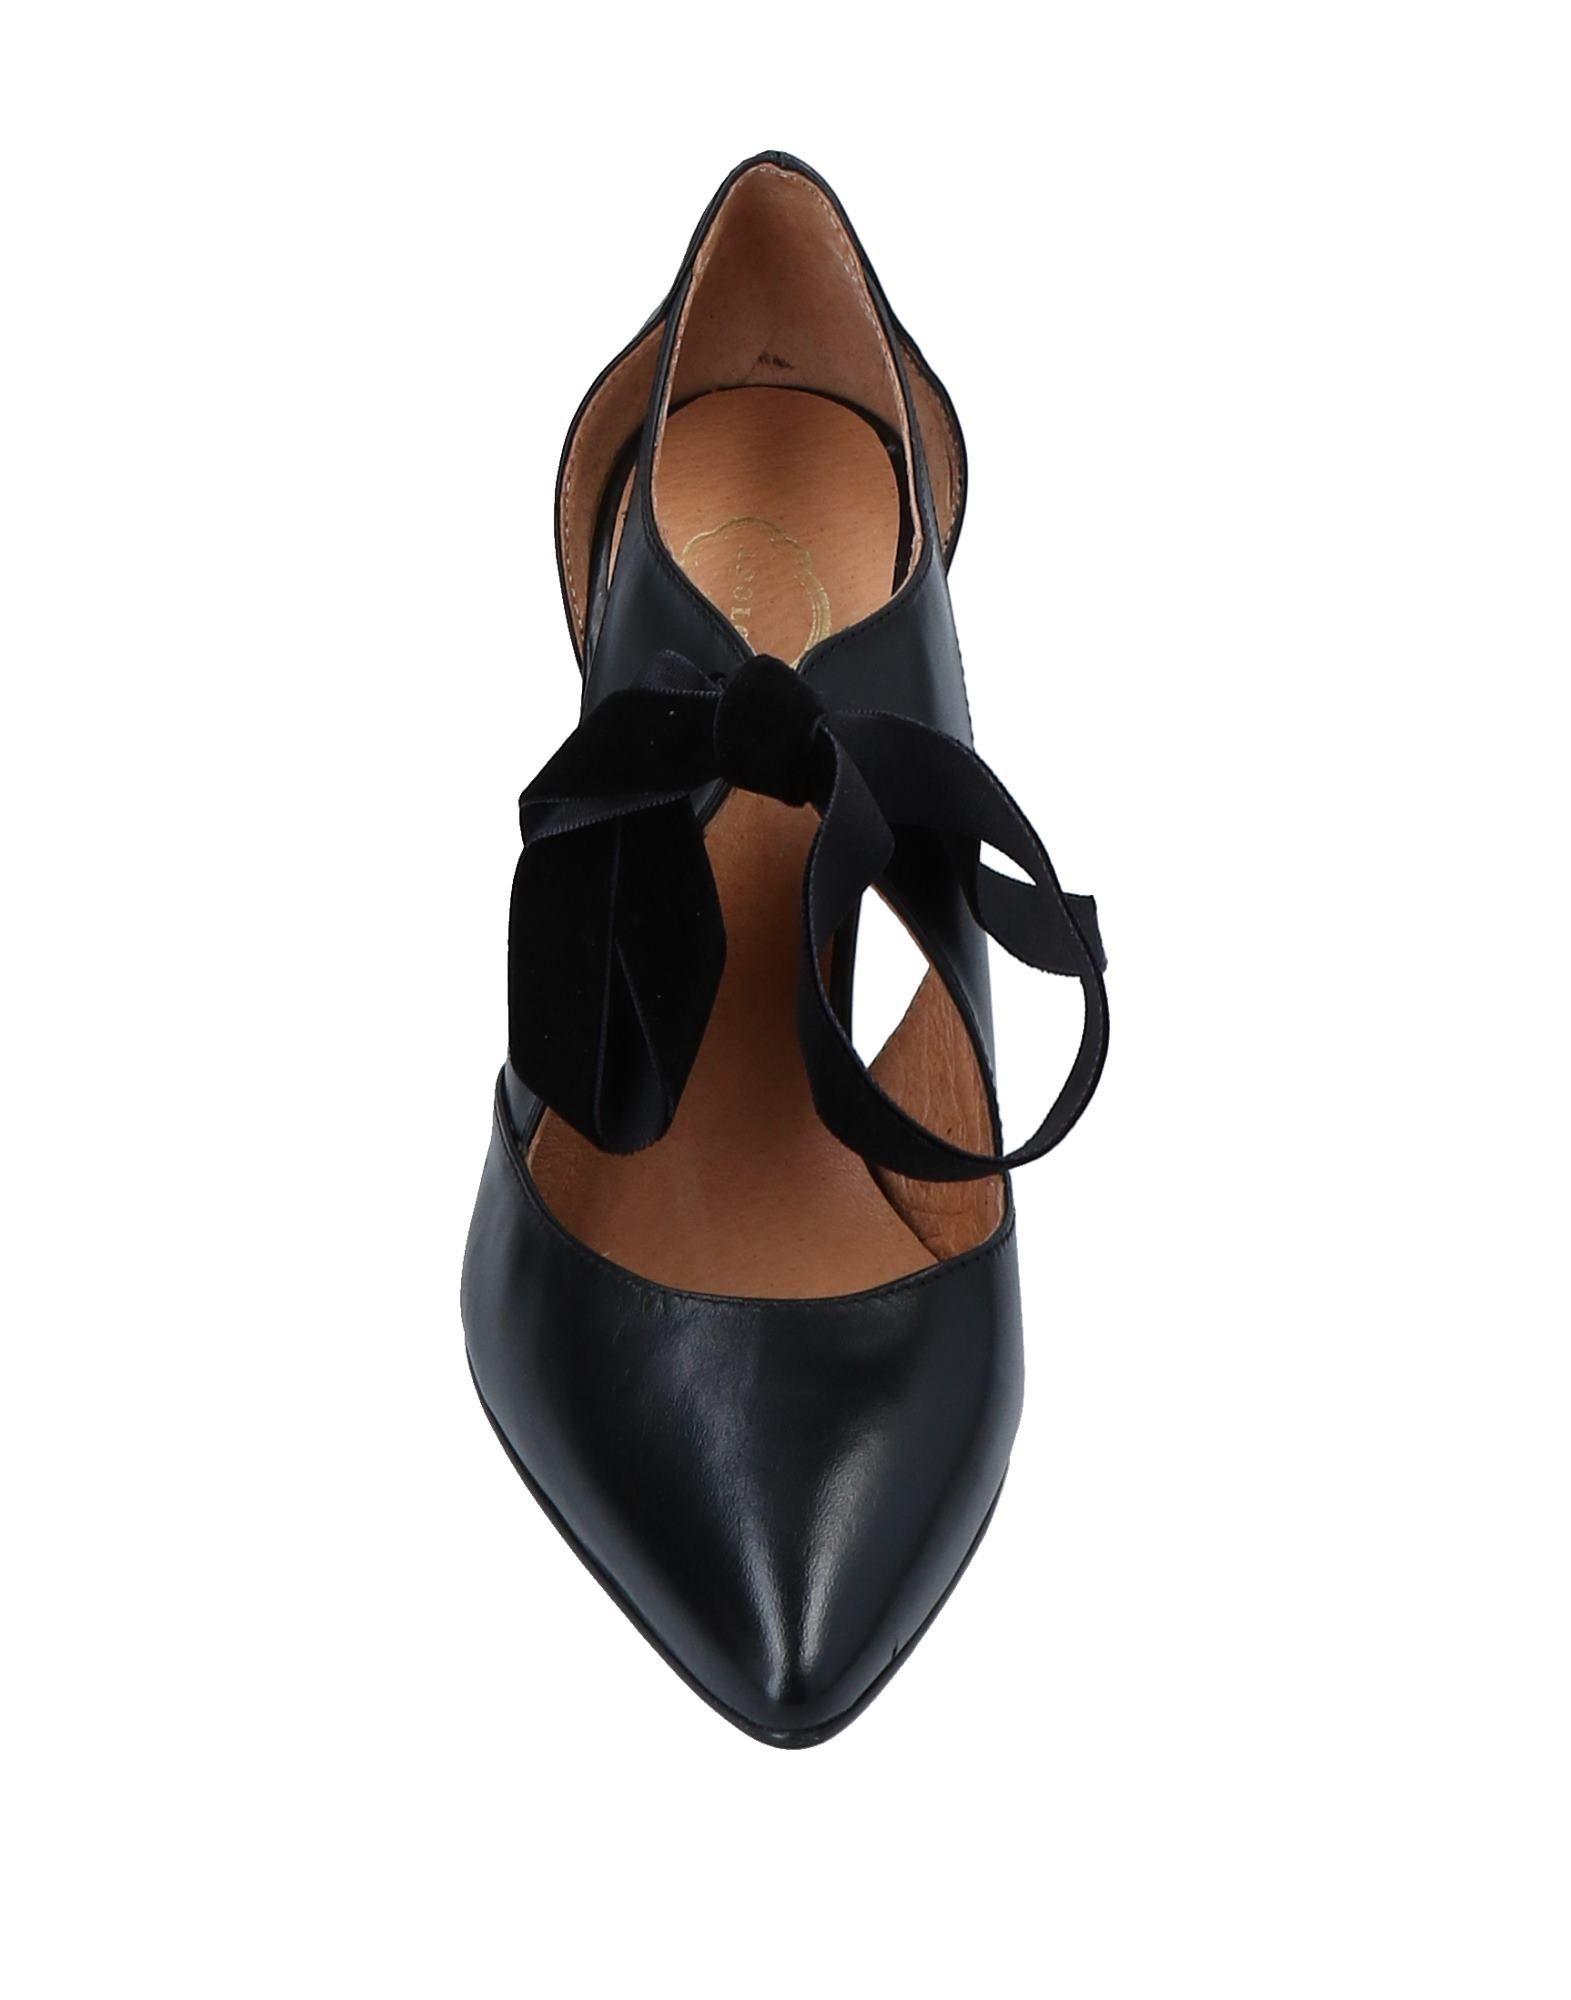 Stilvolle billige  Schuhe Apologie Pumps Damen  billige 11548242DV 63d886